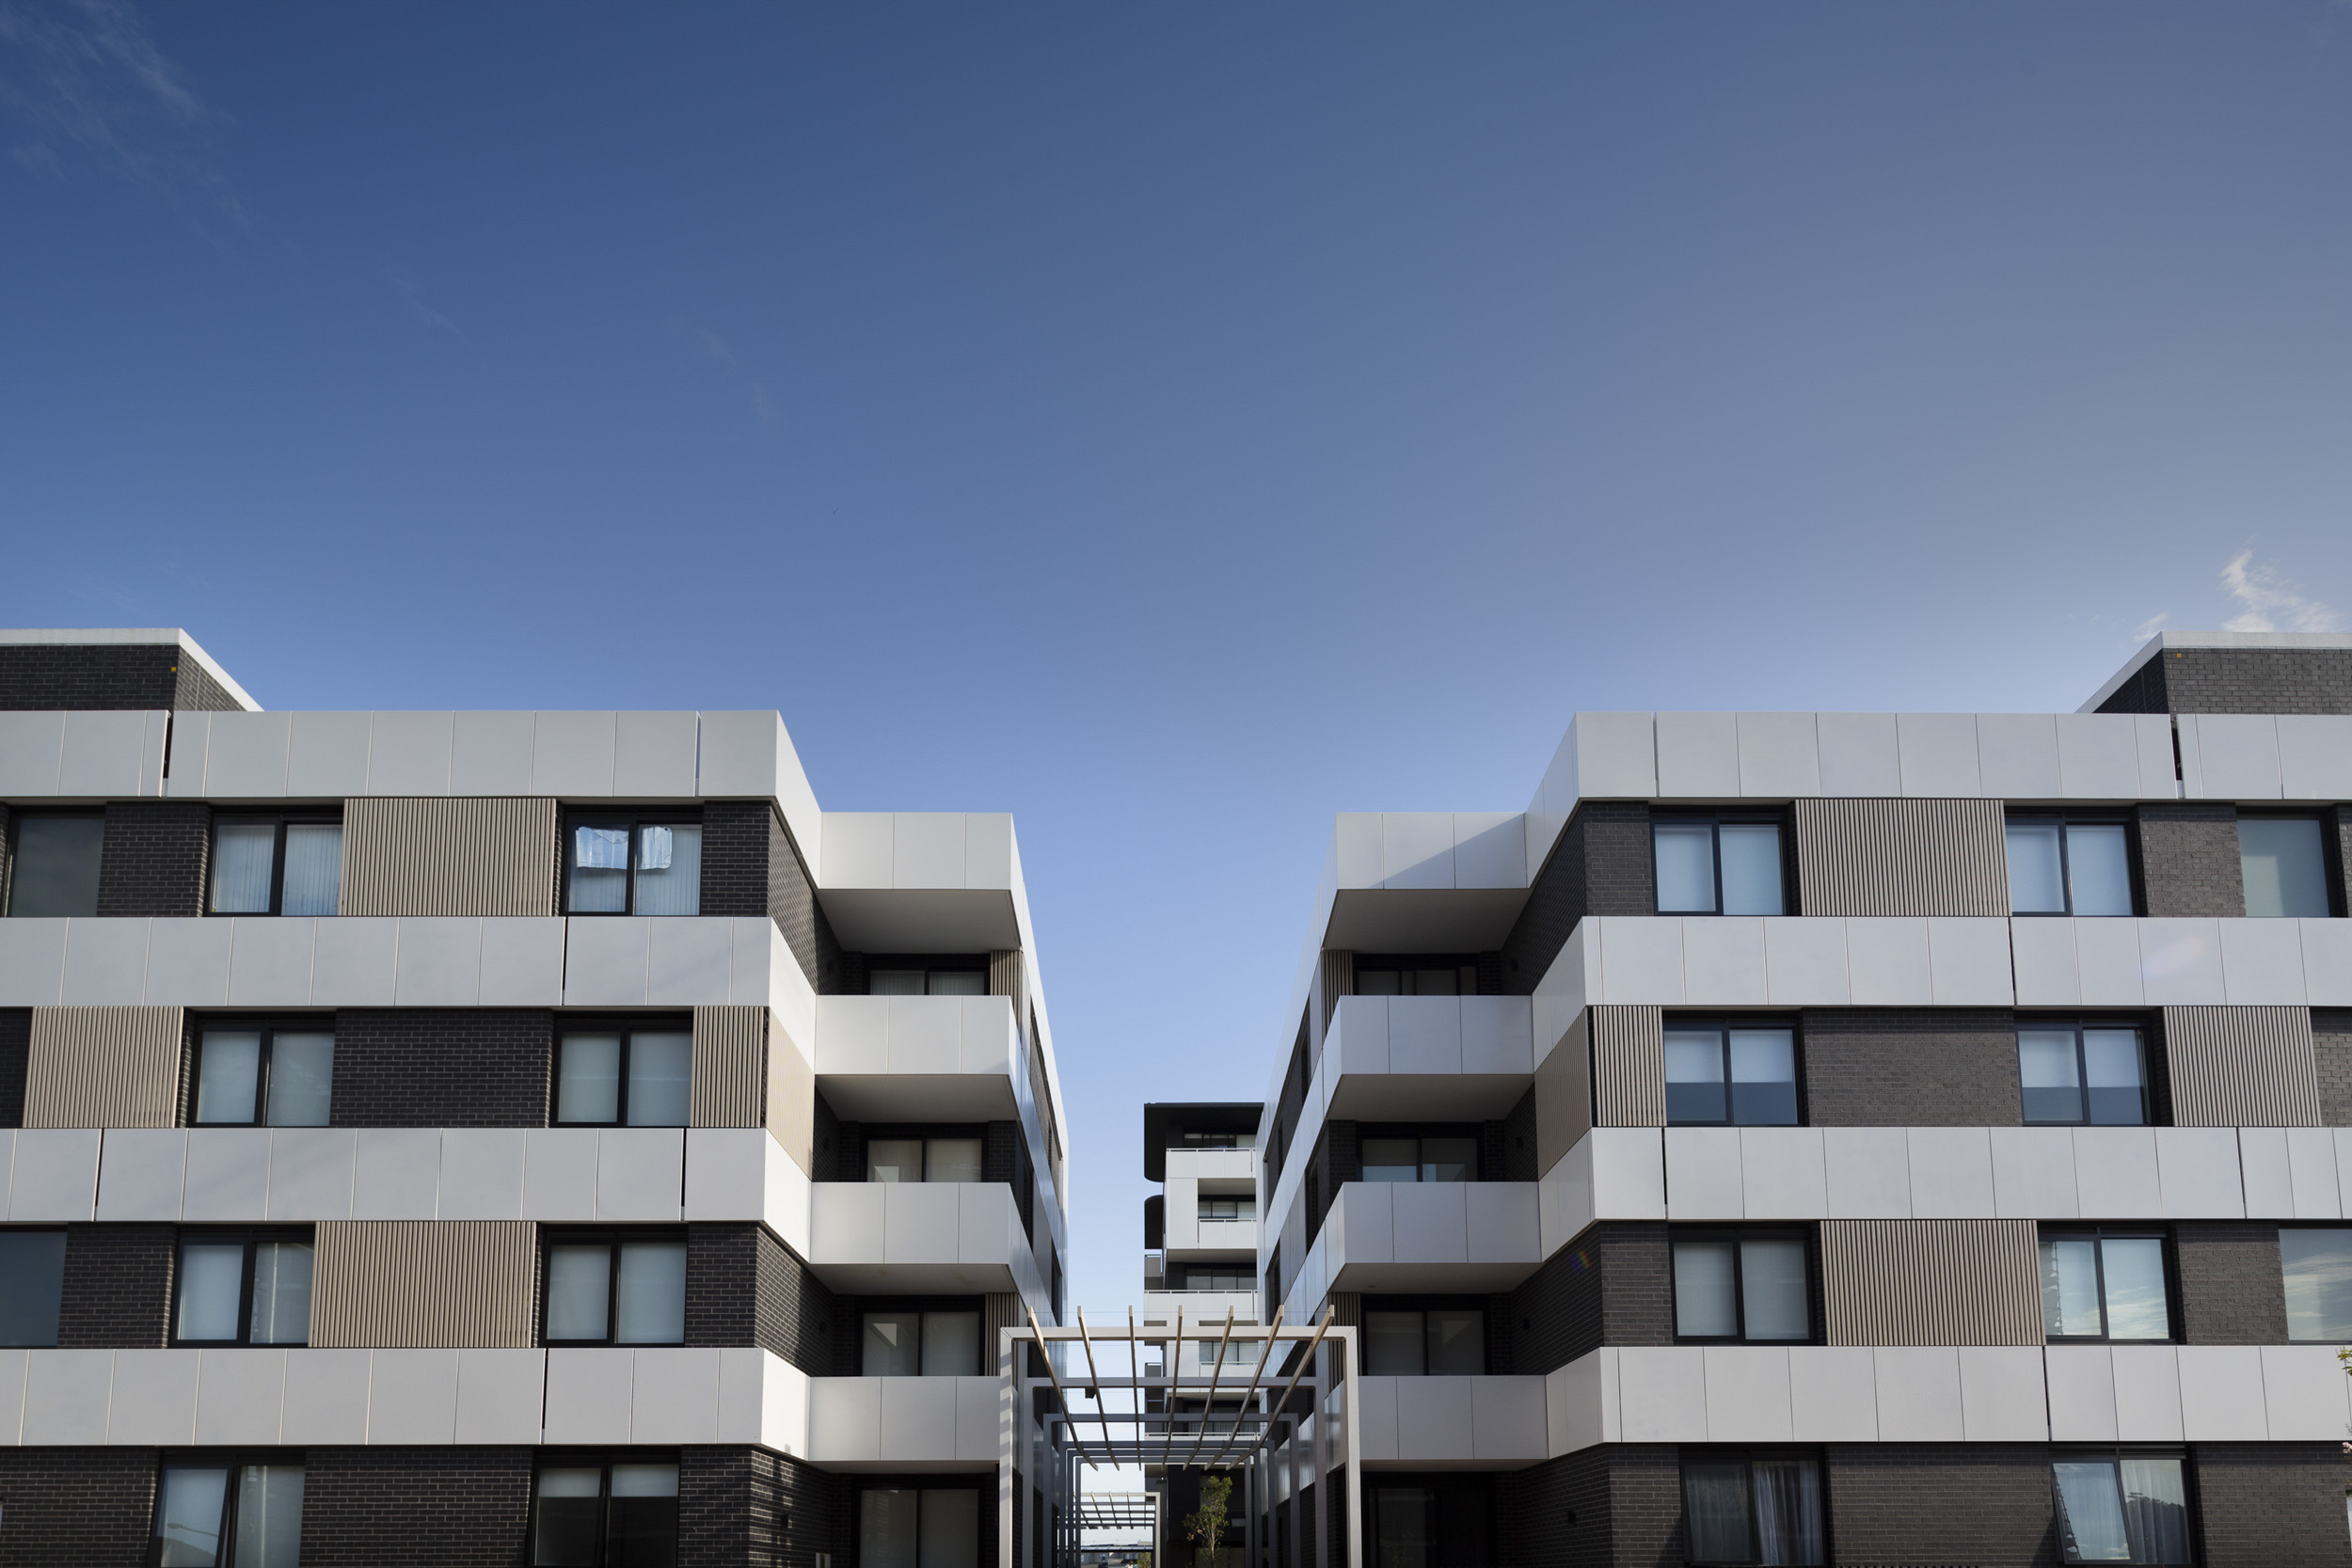 architecture_photography_sydney_australia_24.jpg